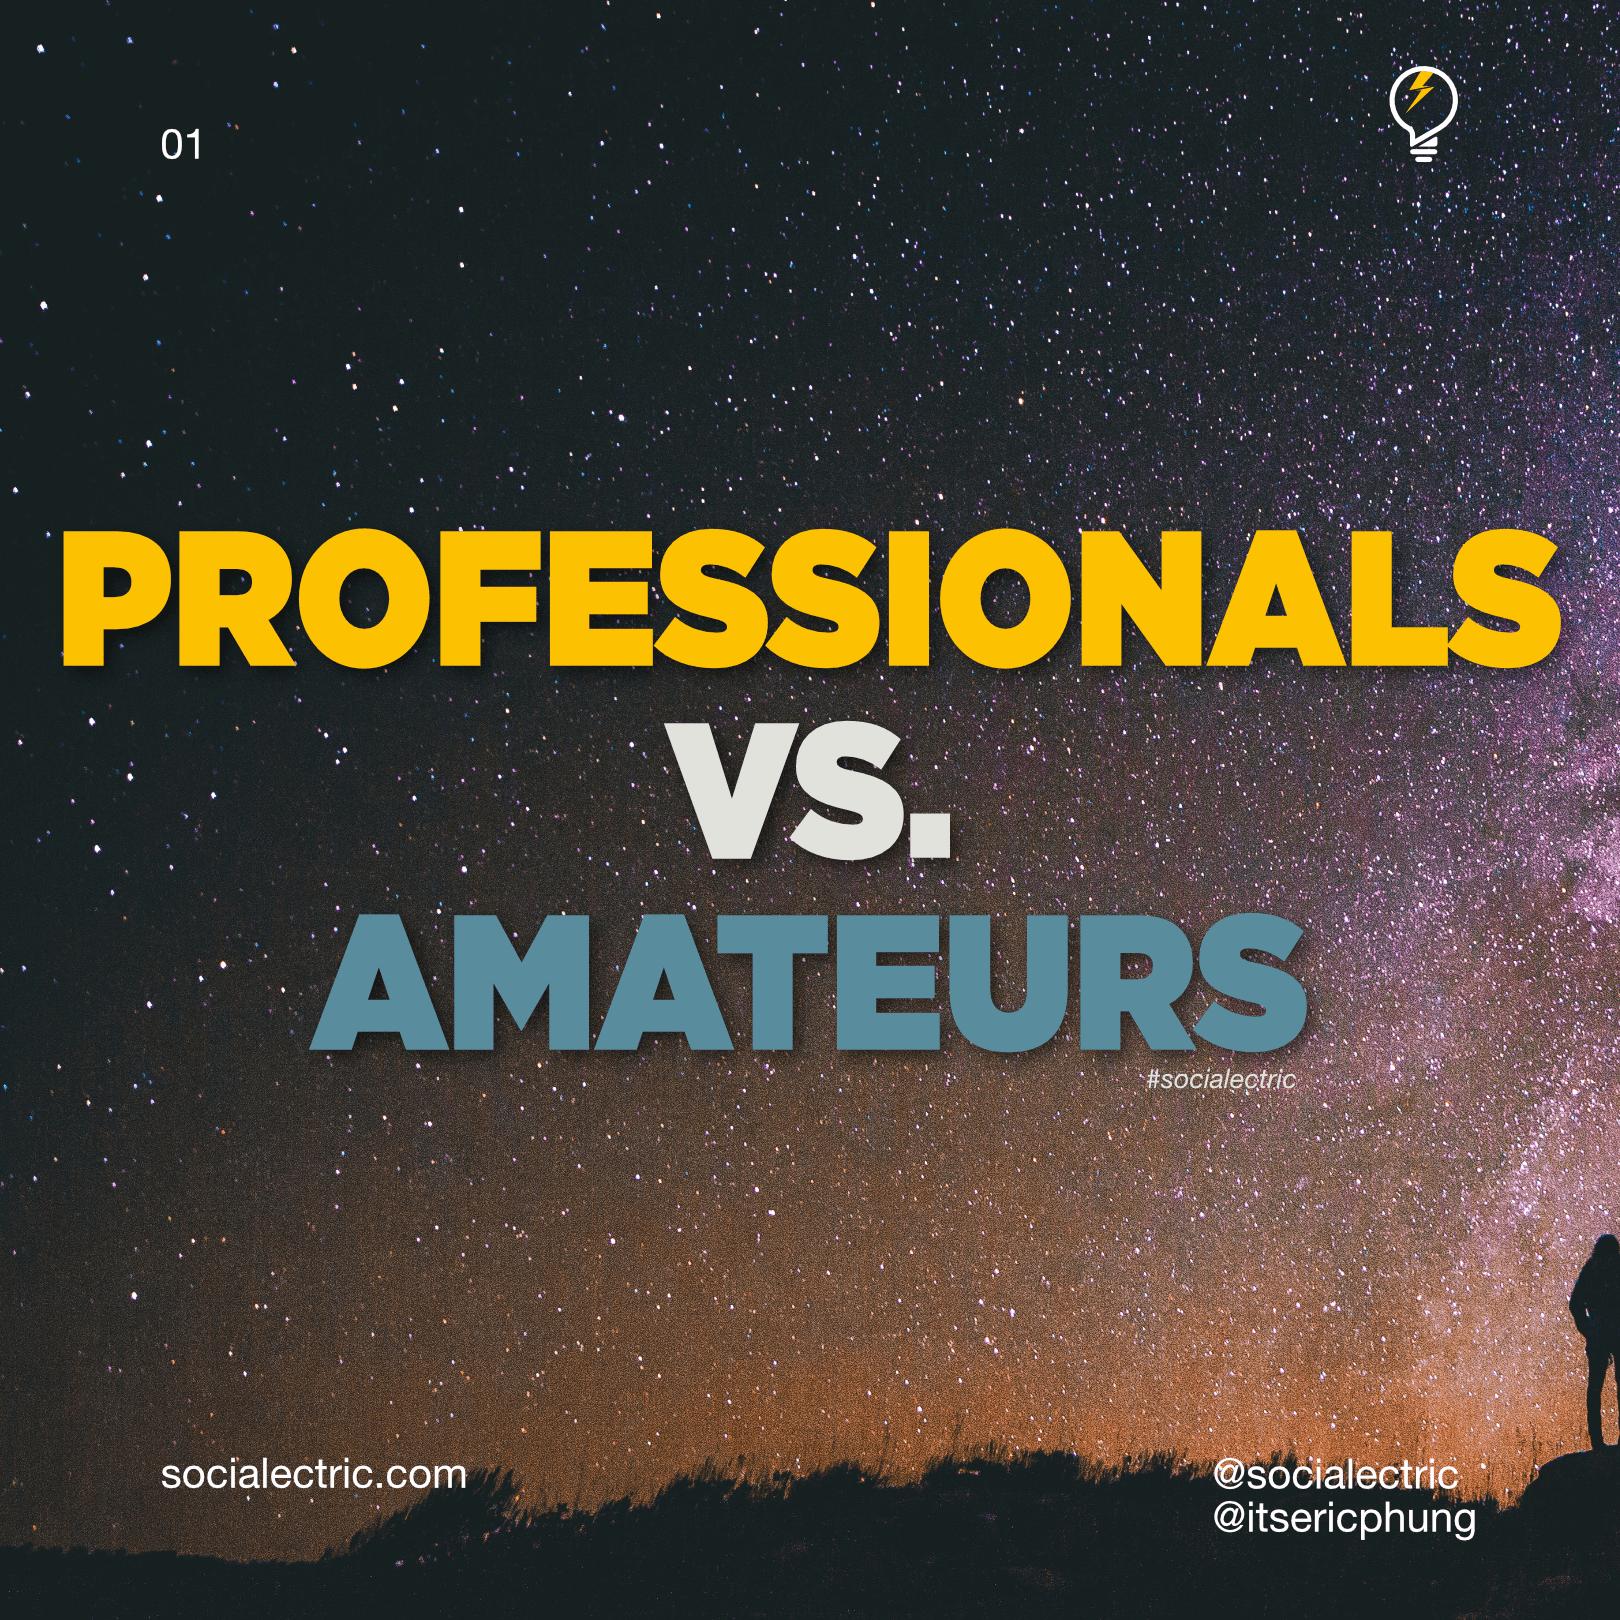 Professionals vs Amateurs - Socialectric Instagram Posts